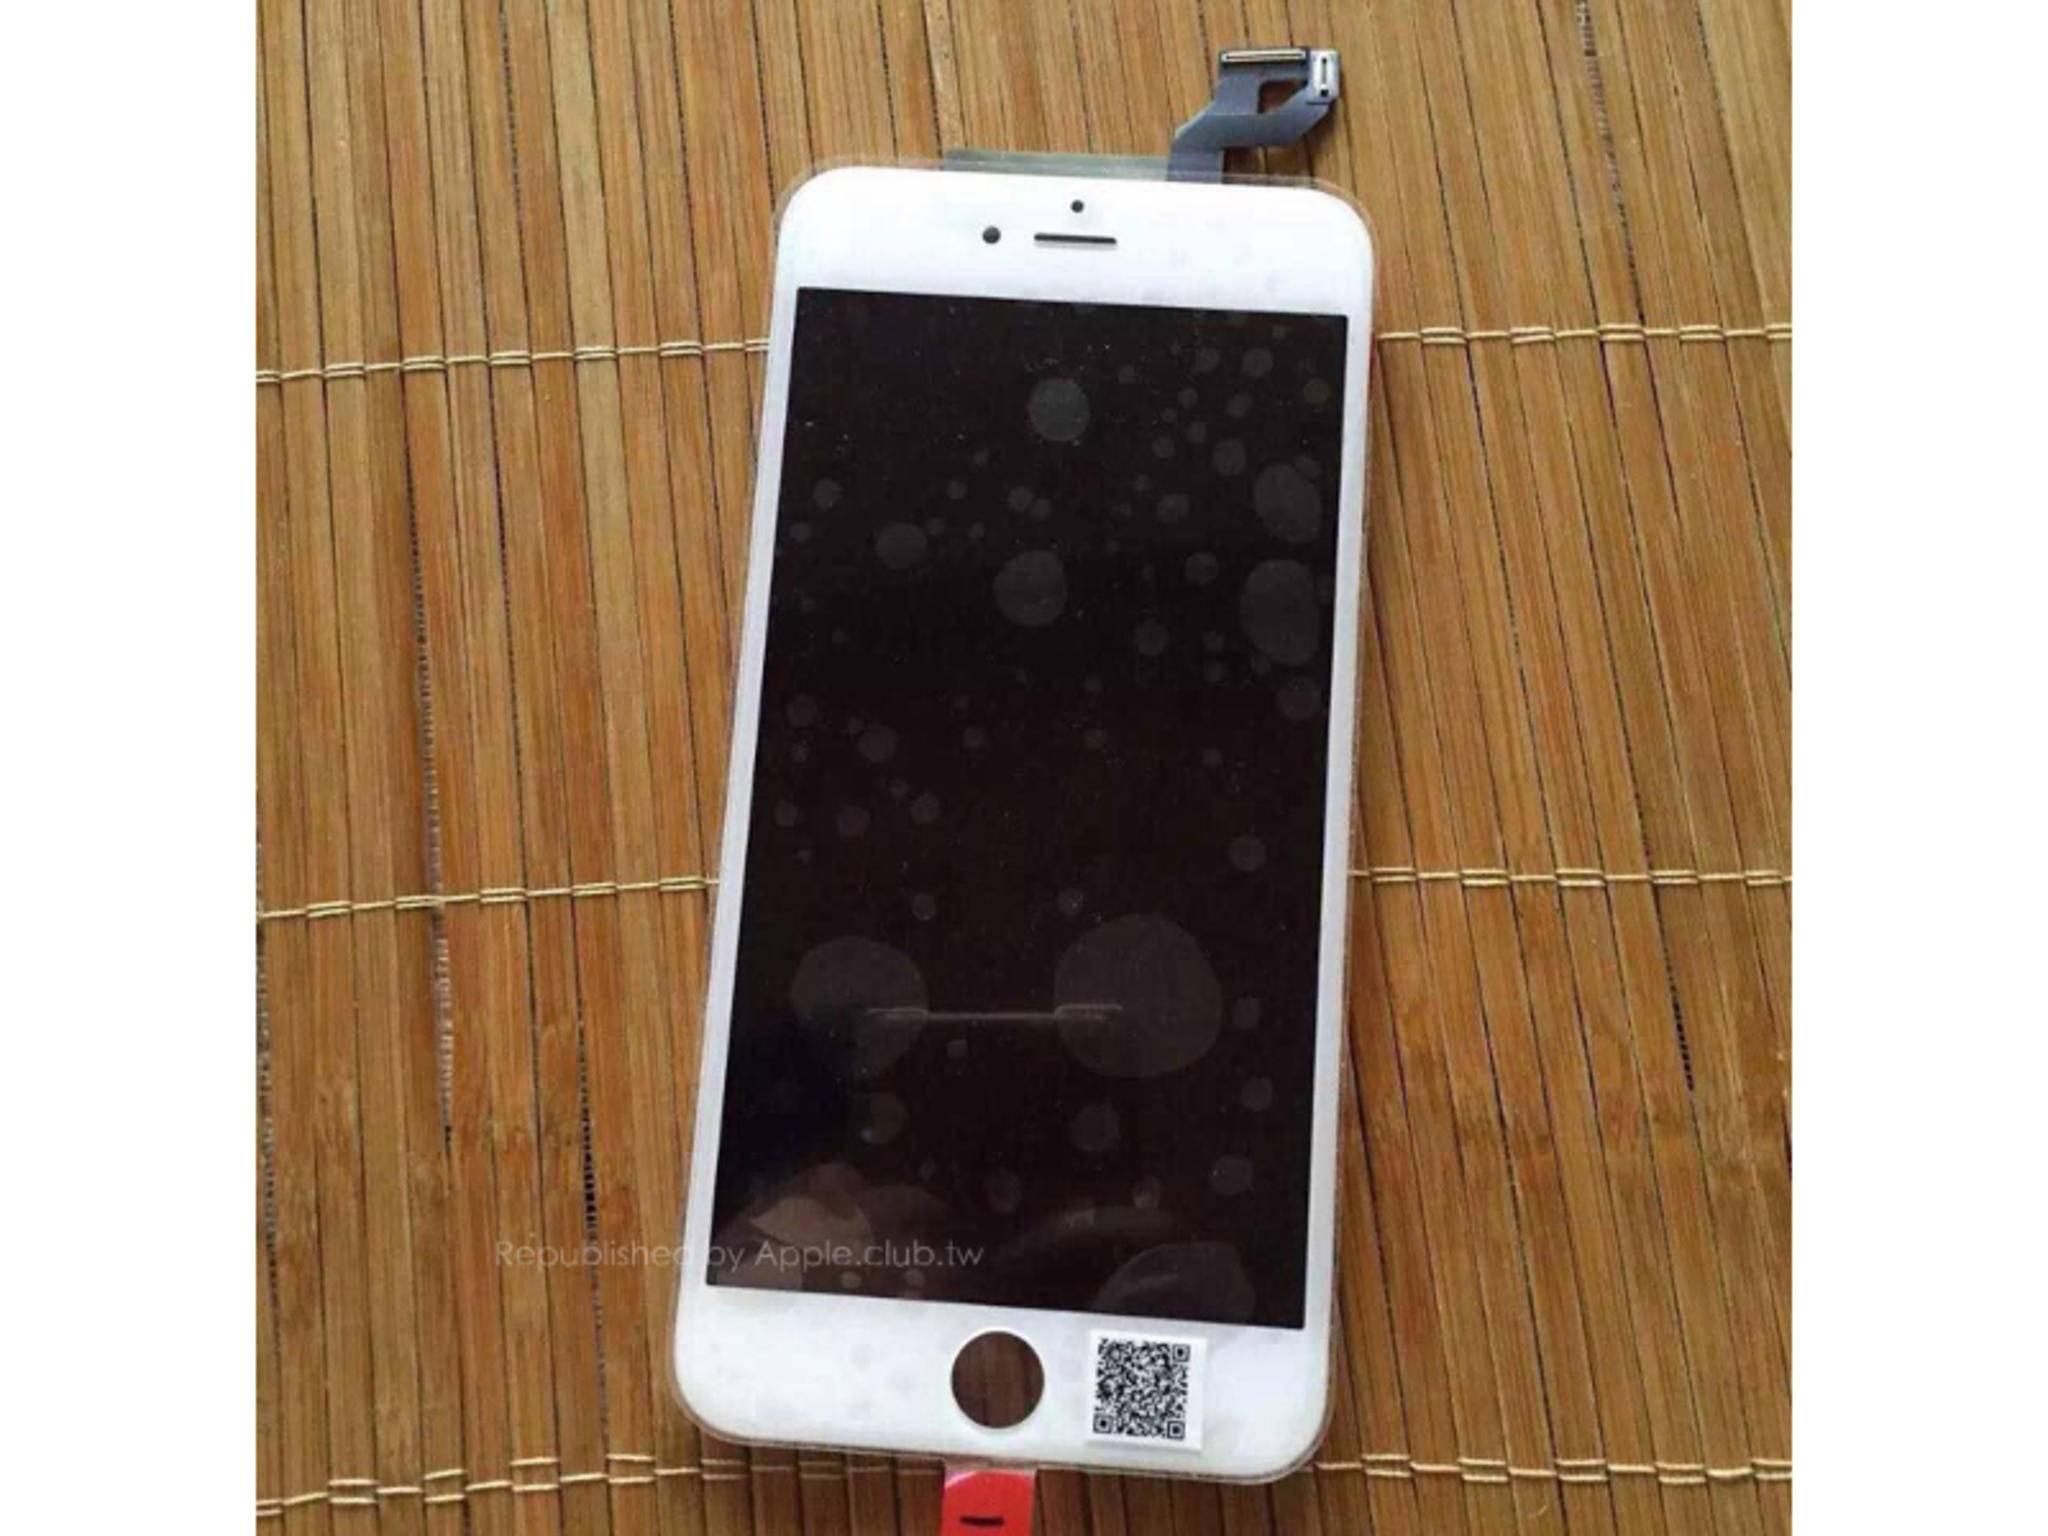 Display des iPhone 6s Plus.